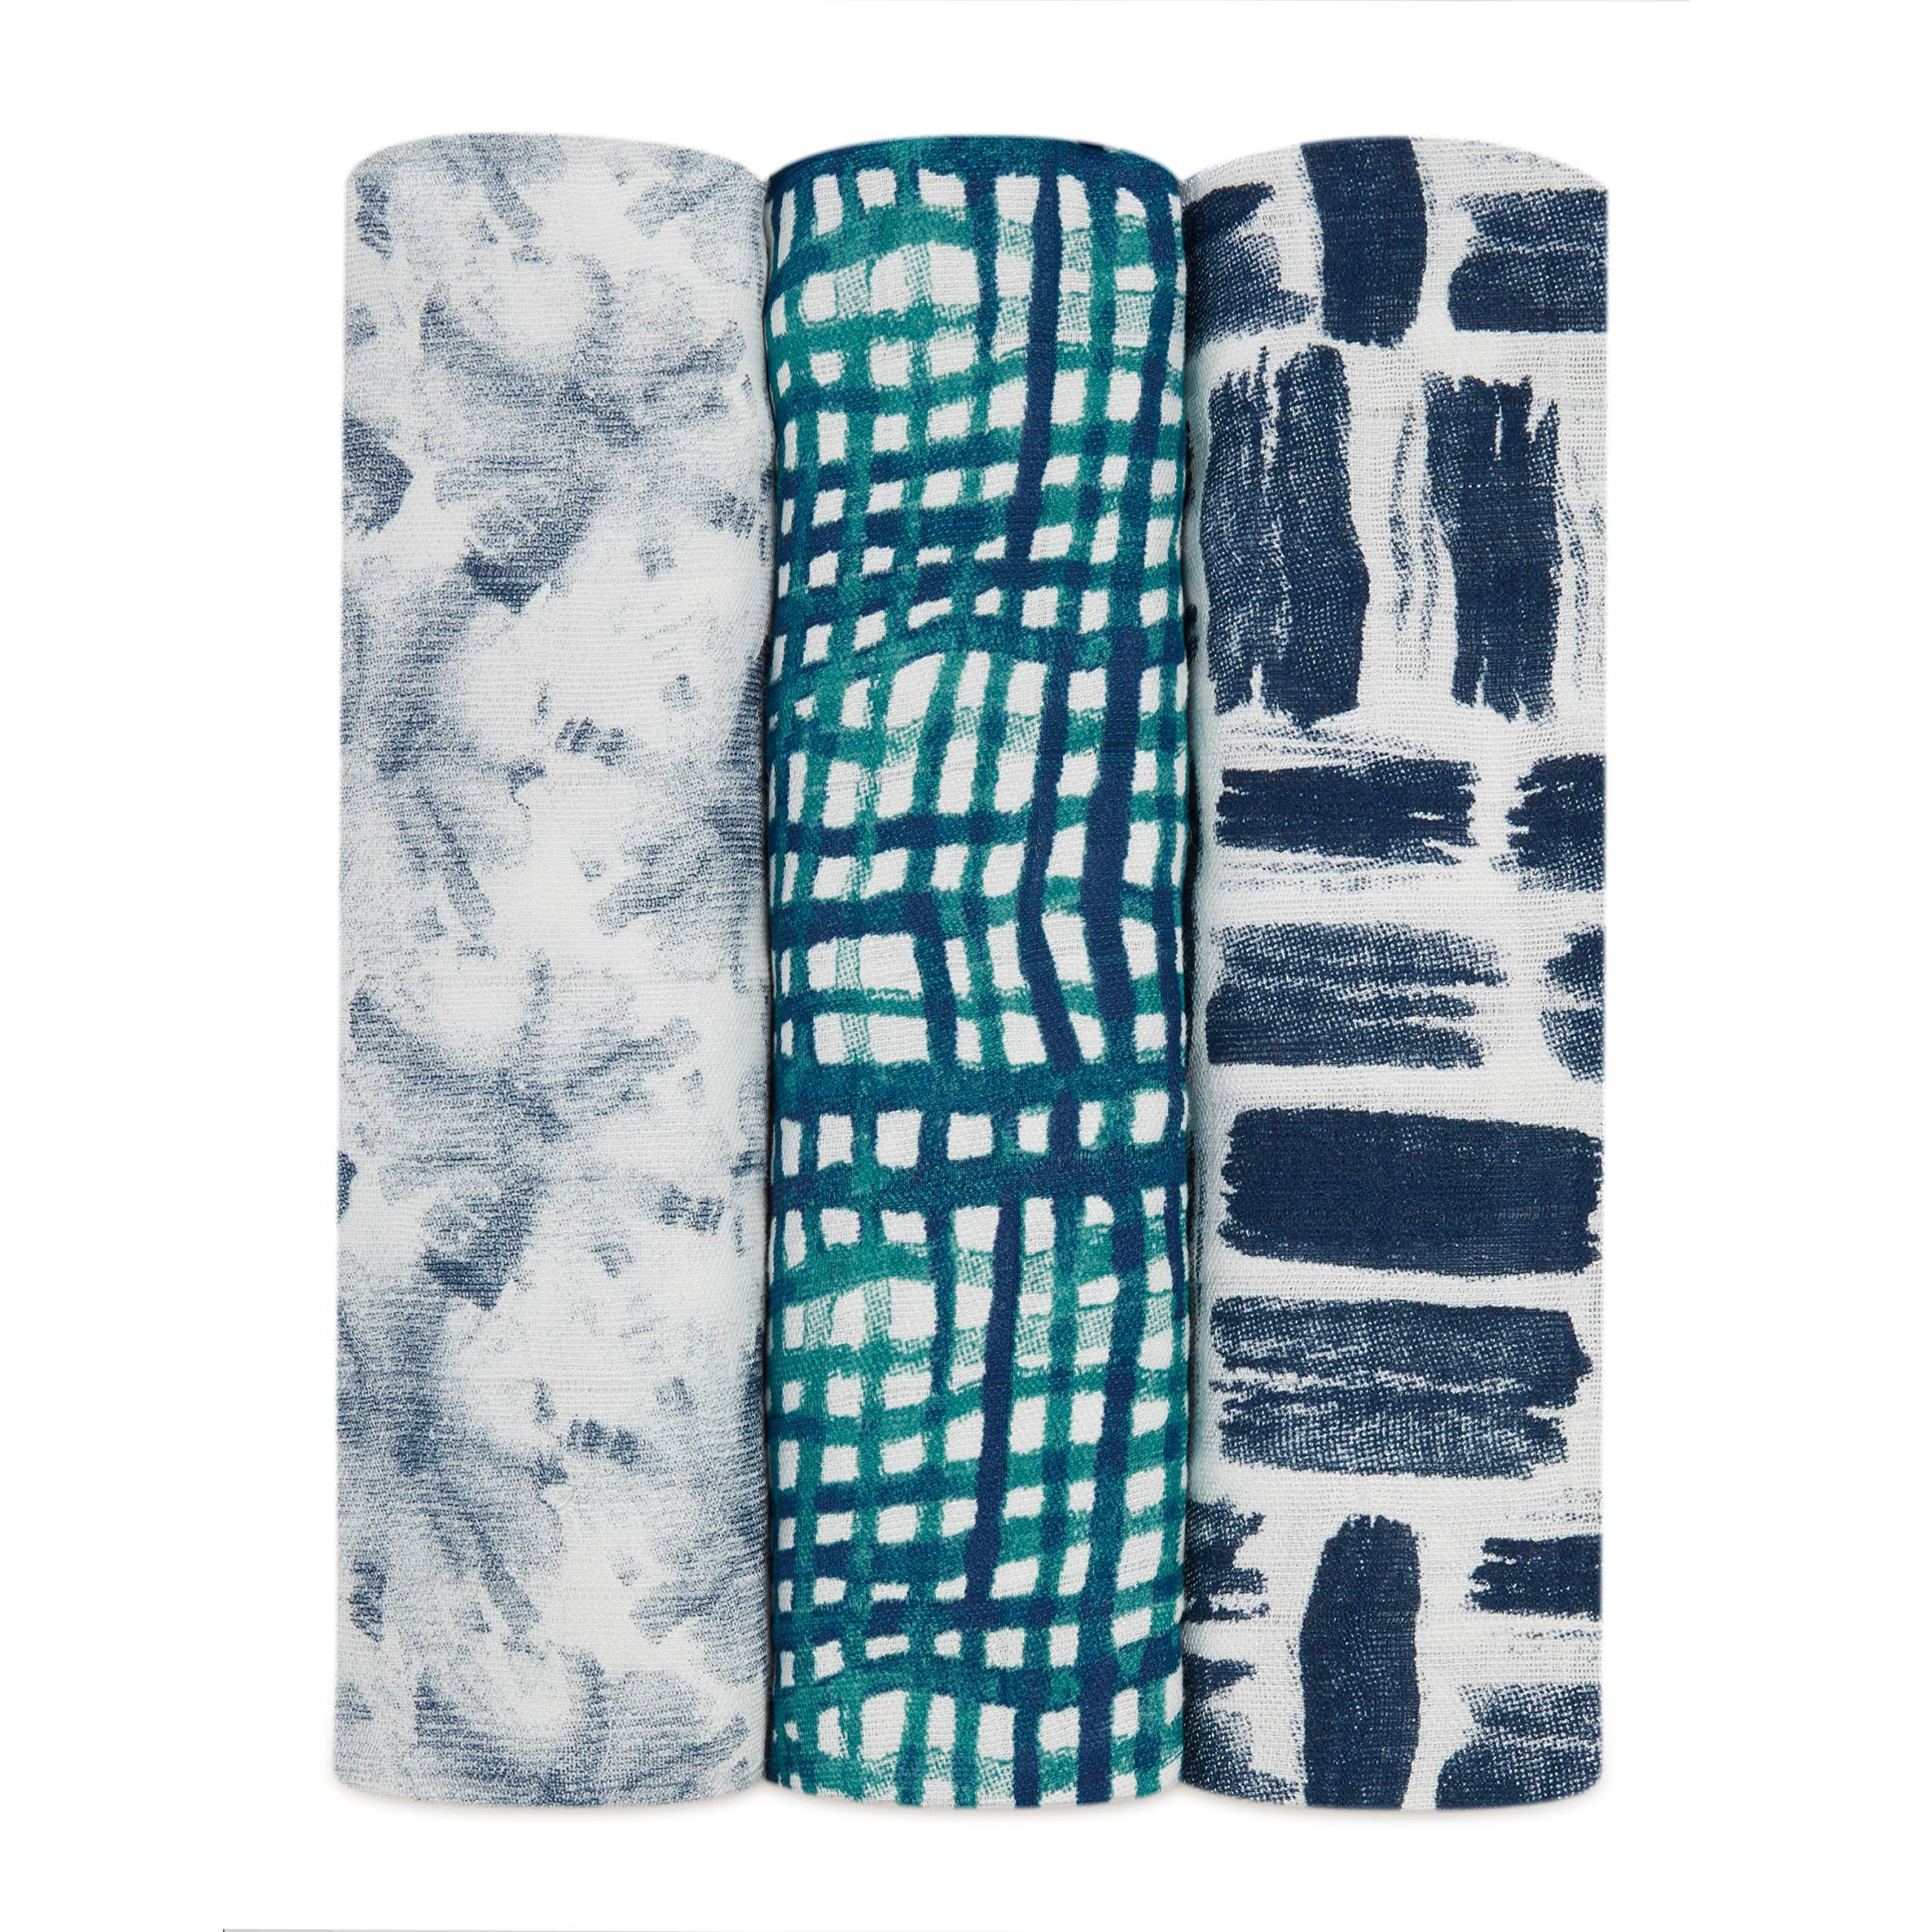 Aden + Anais Seaport - Pack de 3 muselinas, unisex product image